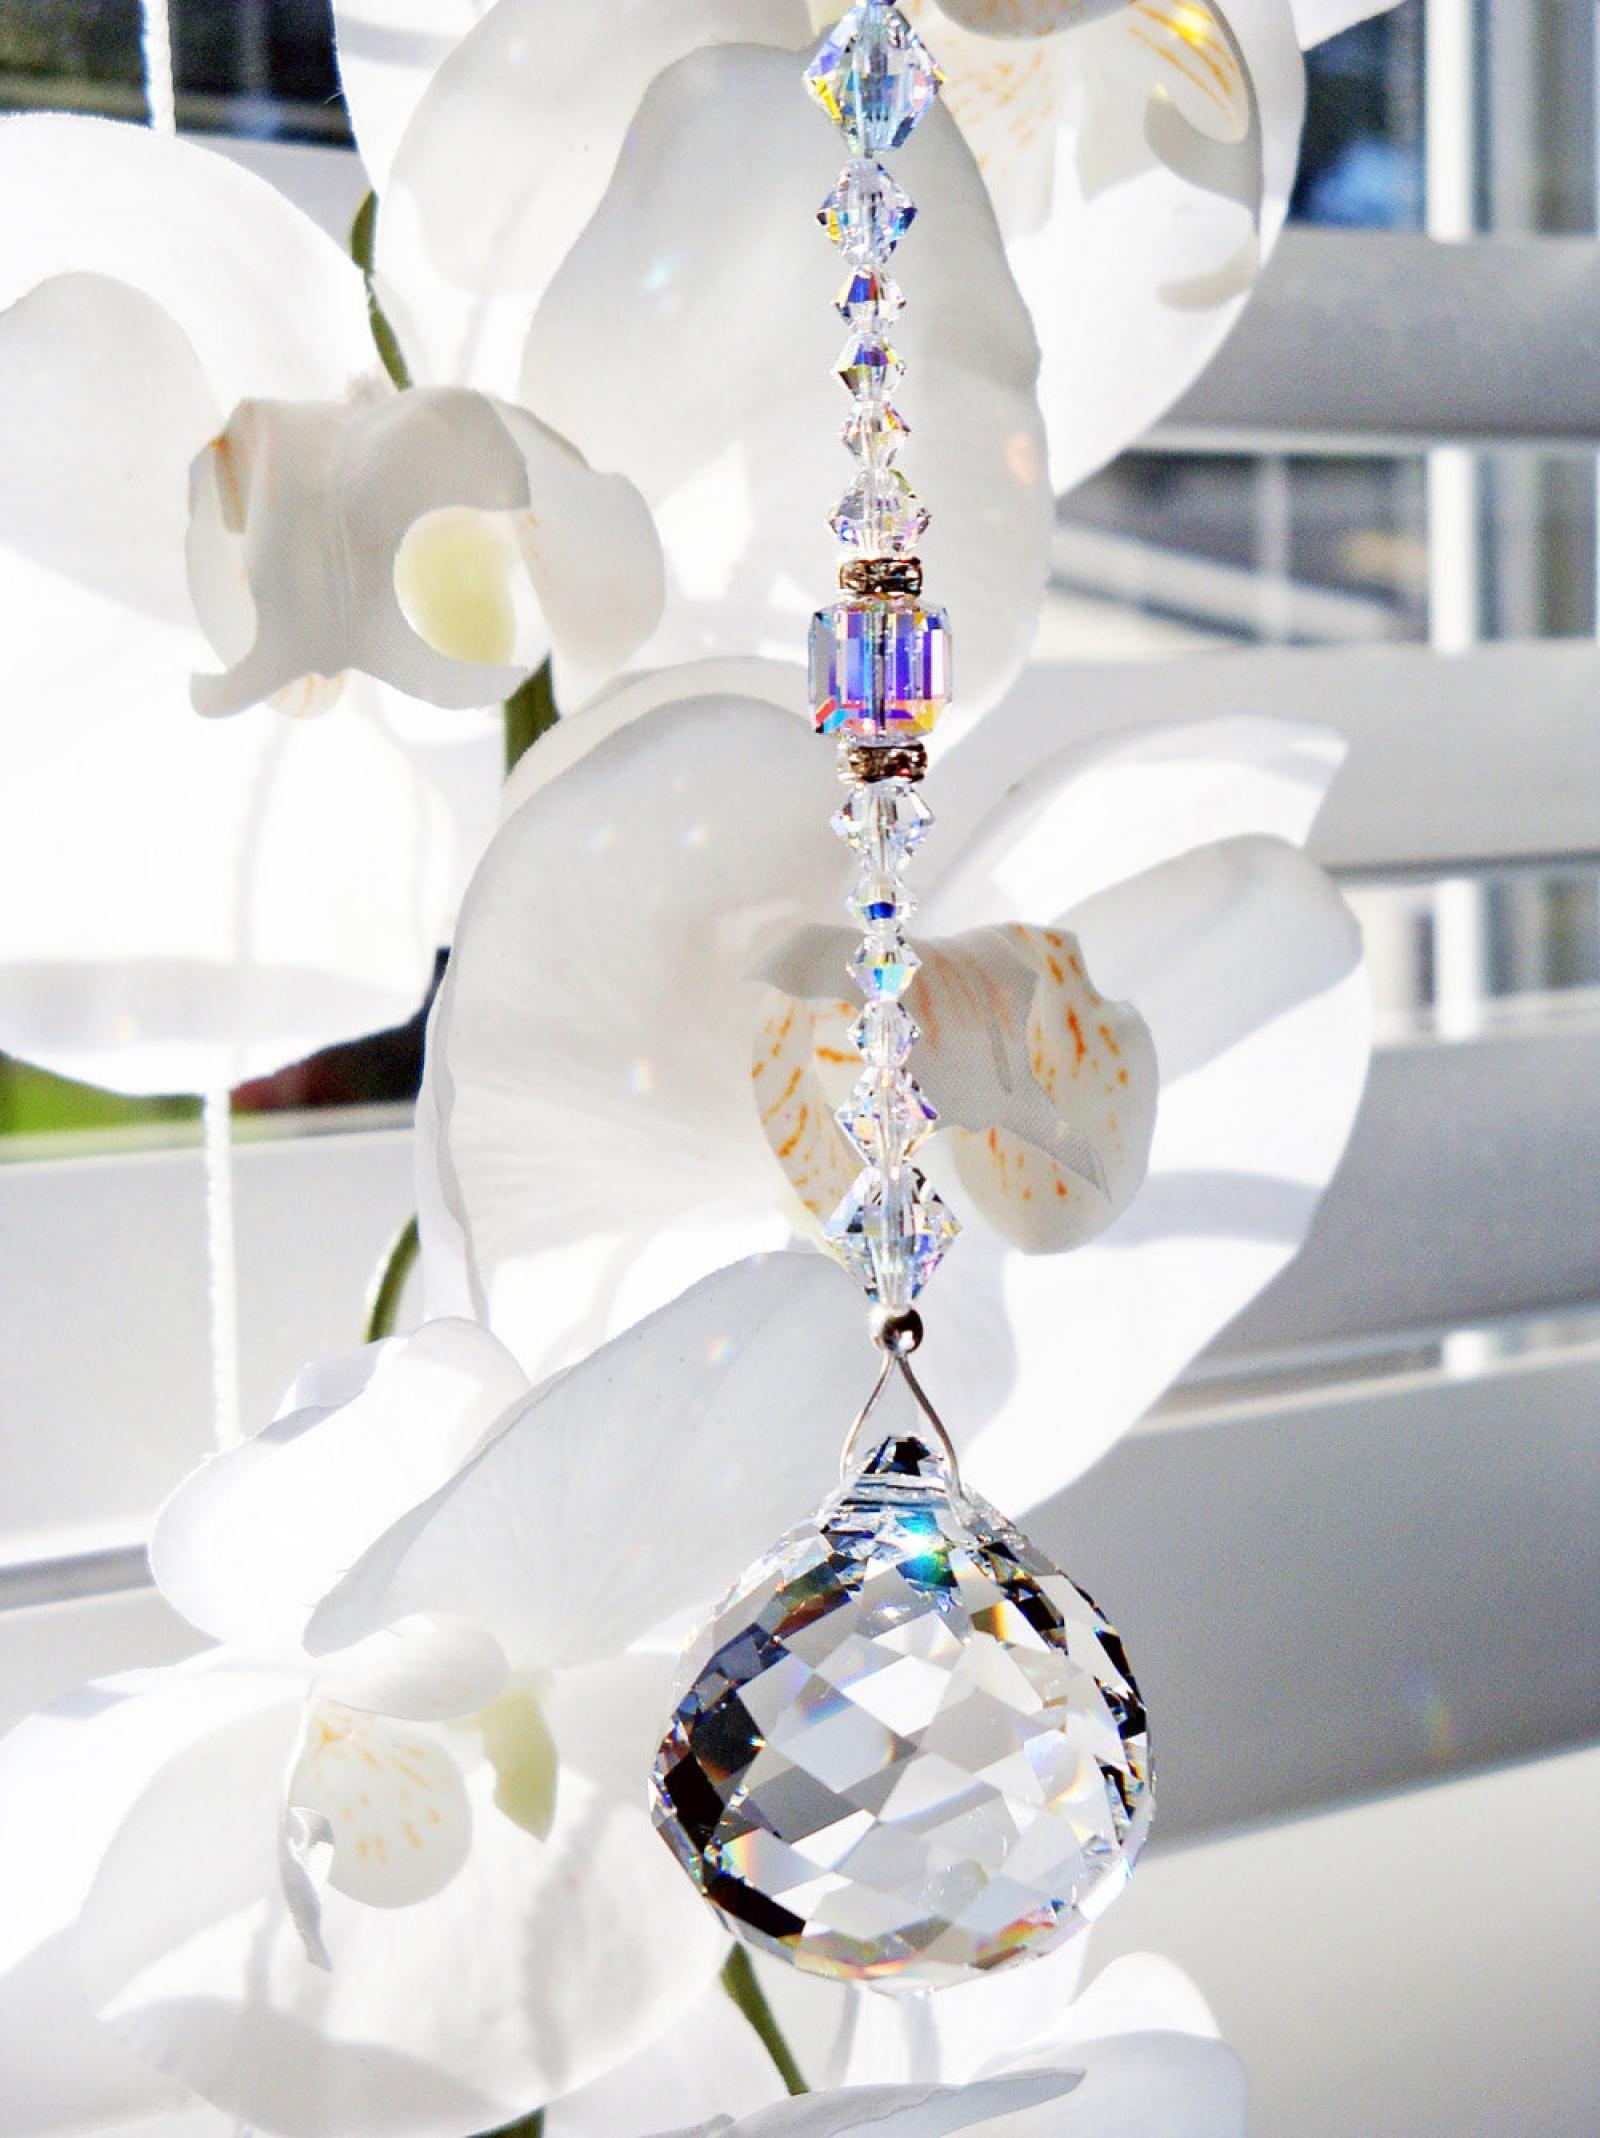 Ceiling Light Pull Chain